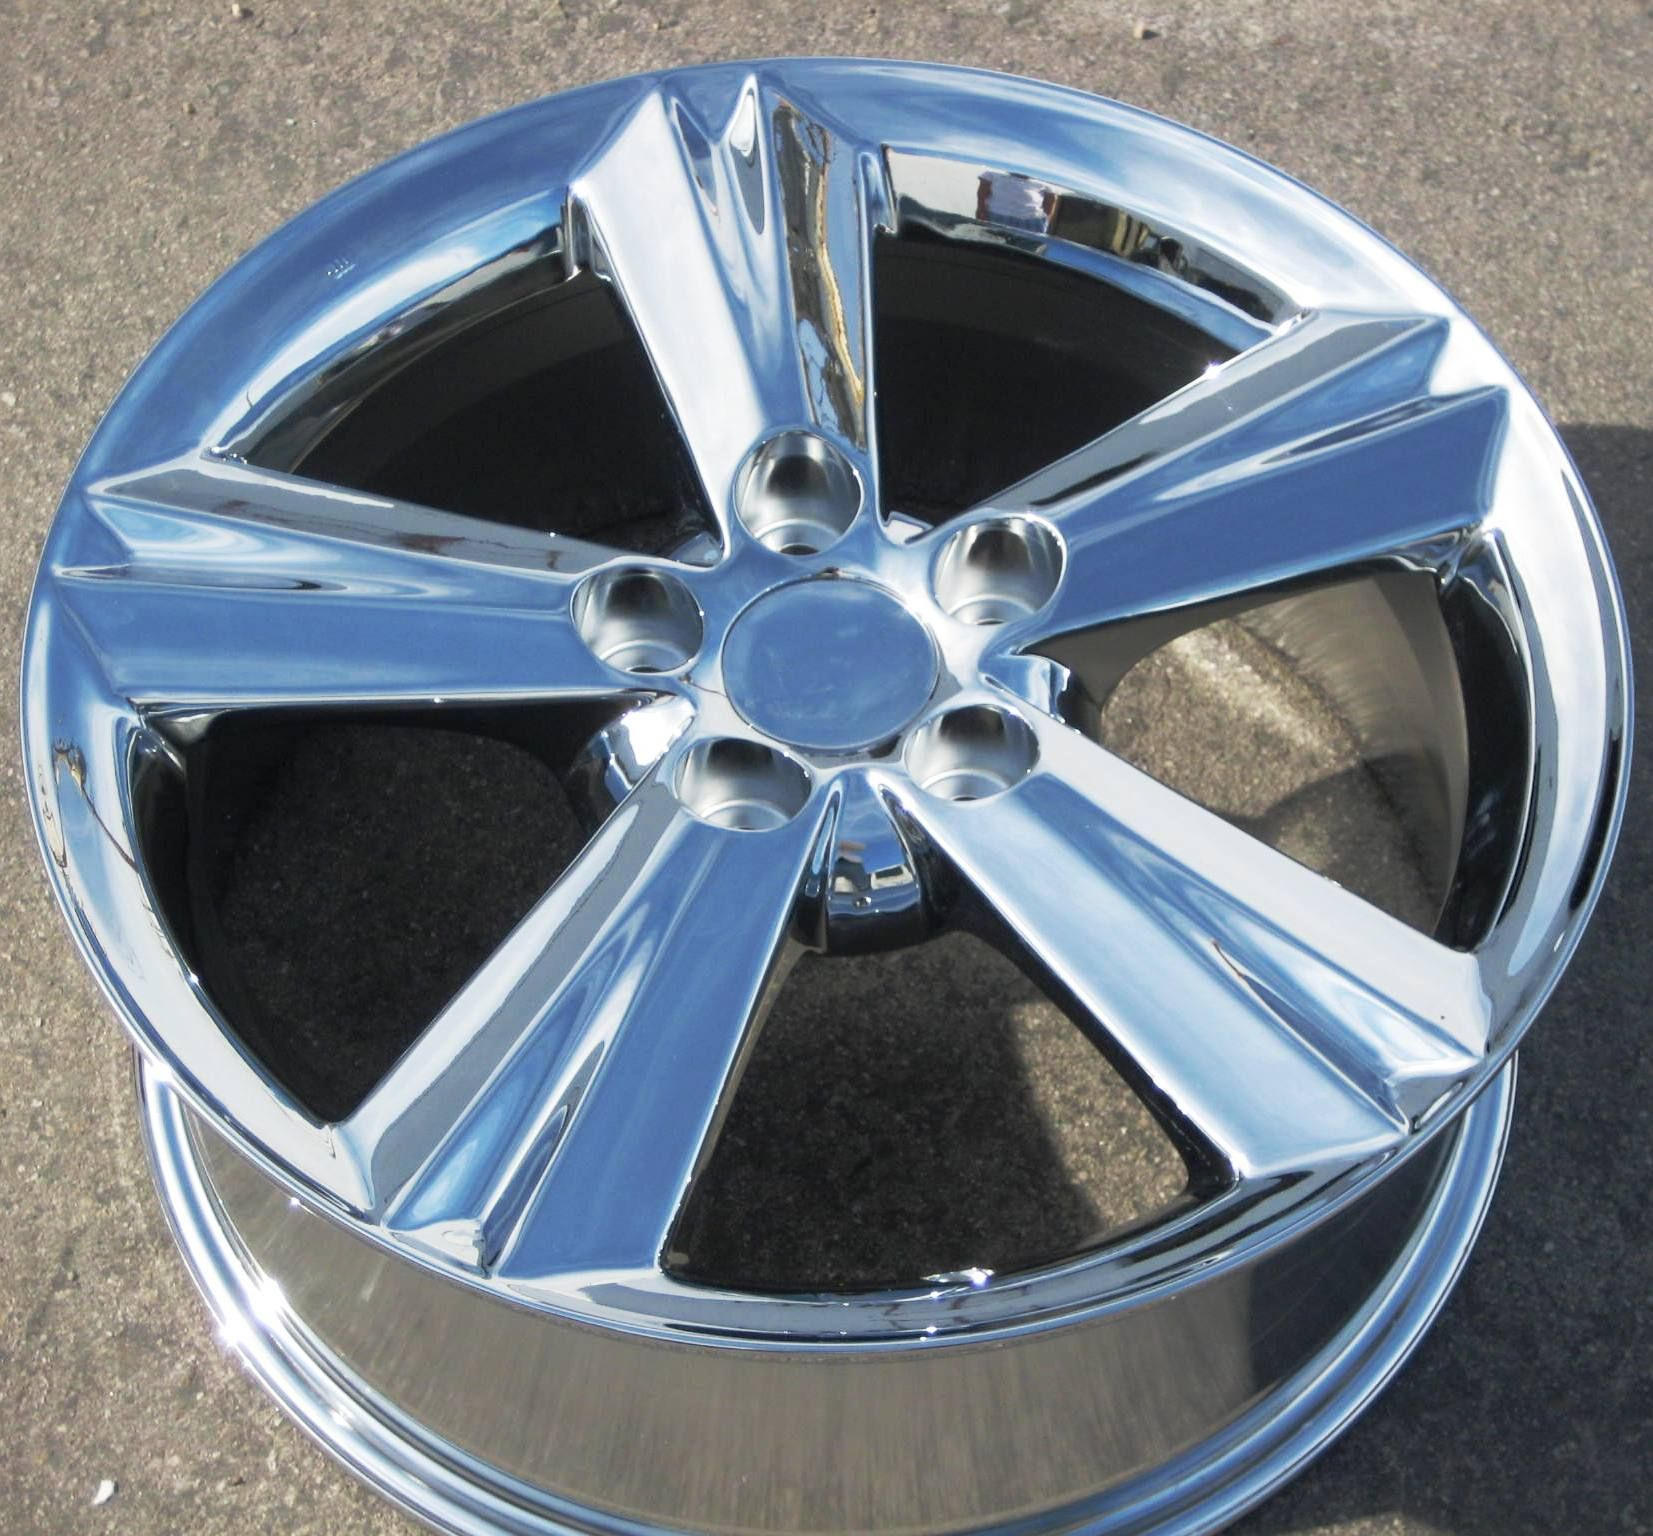 Toyota Matrix s Camry Scion RX300 RX330 Wheels Rims Set of 4